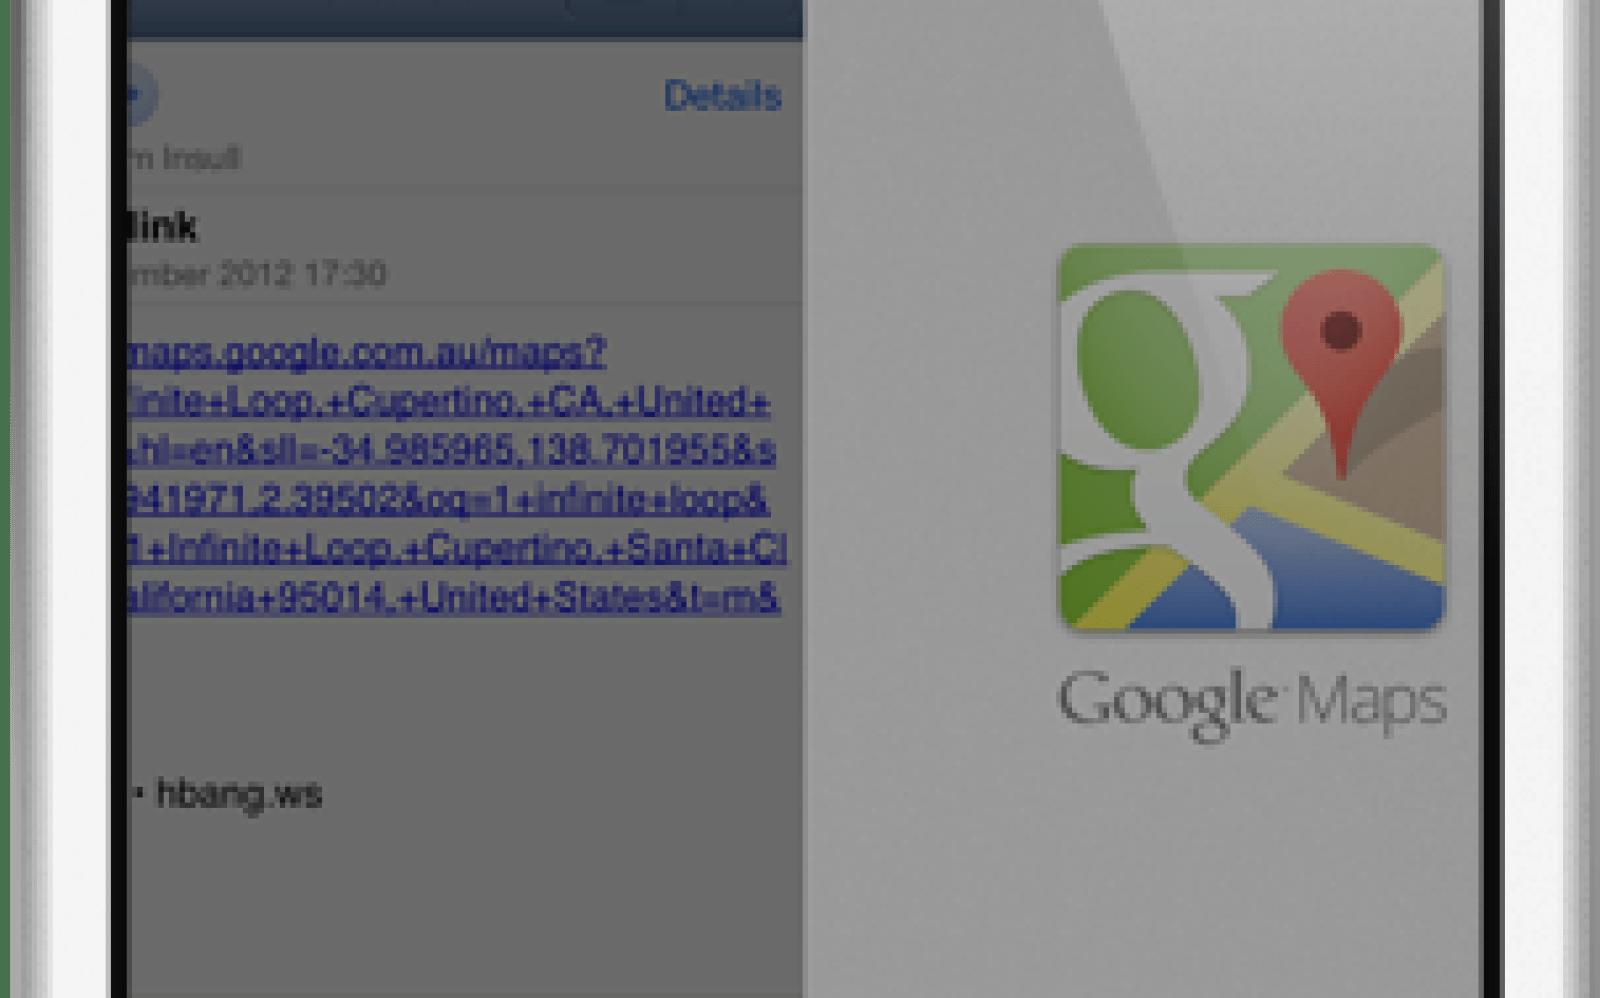 MapsOpener jailbreak tweak sets Google Maps as default maps